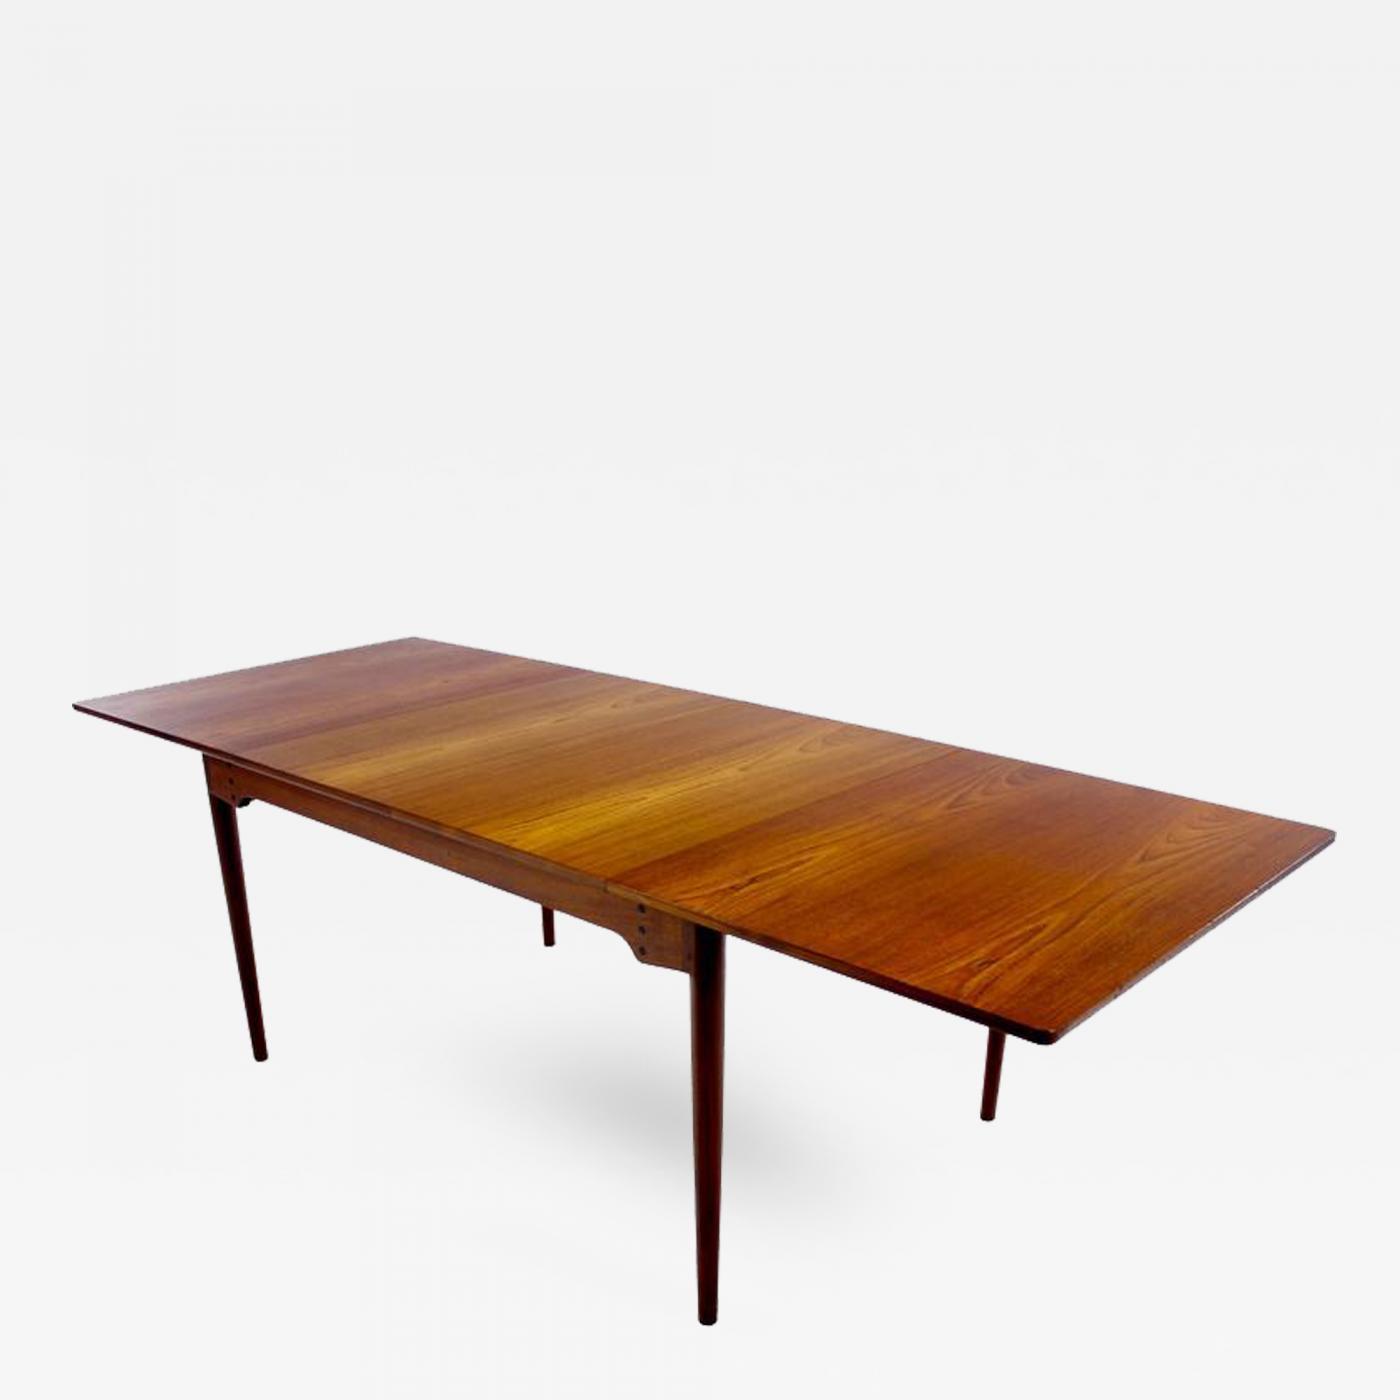 finn juhl danish modern teak dining table designed by finn juhl rh incollect com mid century modern dining room danish modern dining room tables